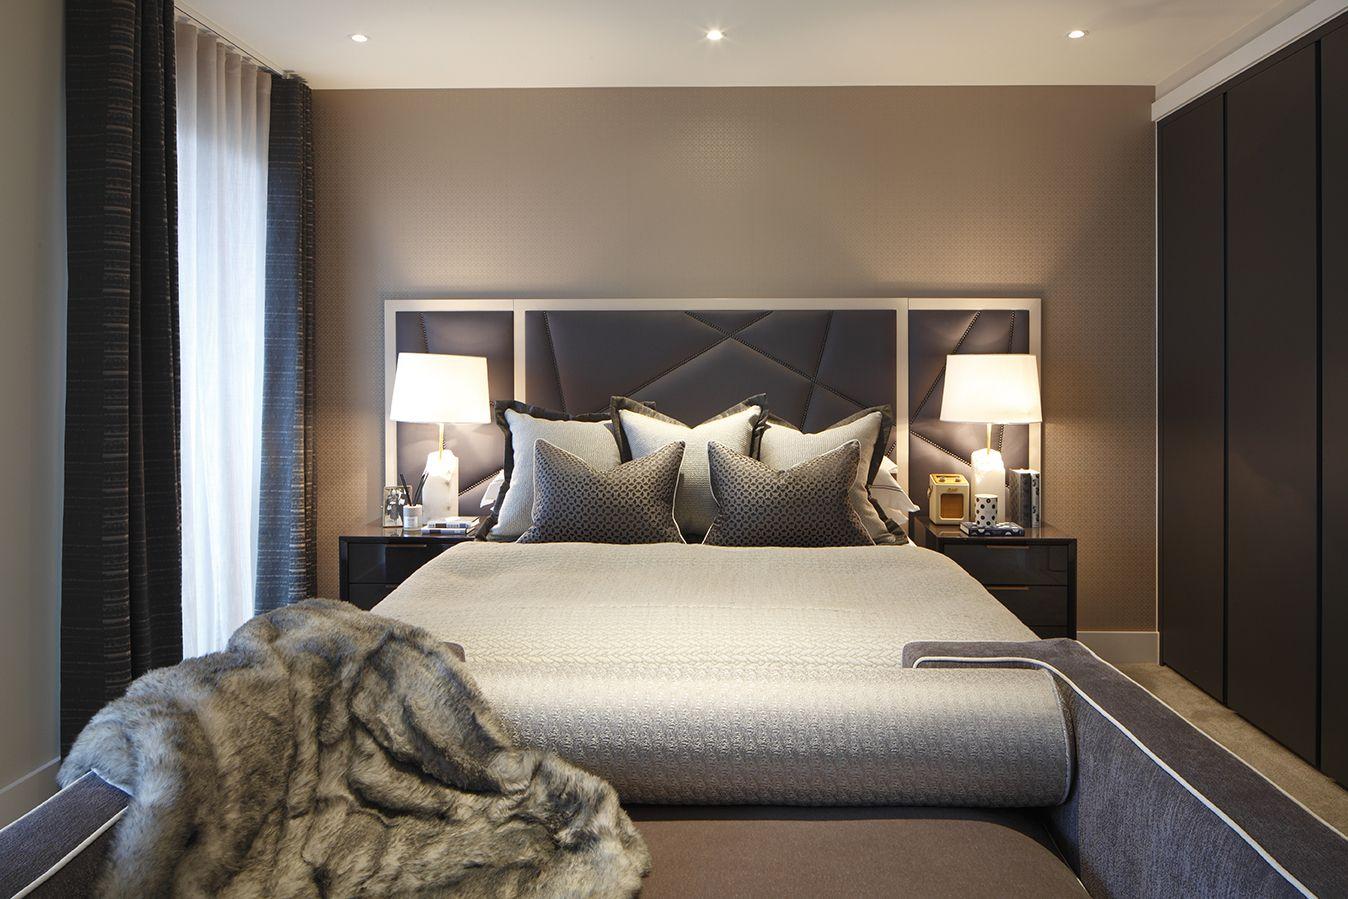 London Luxury Bedroom By Rachel Winham Modern Interior Design